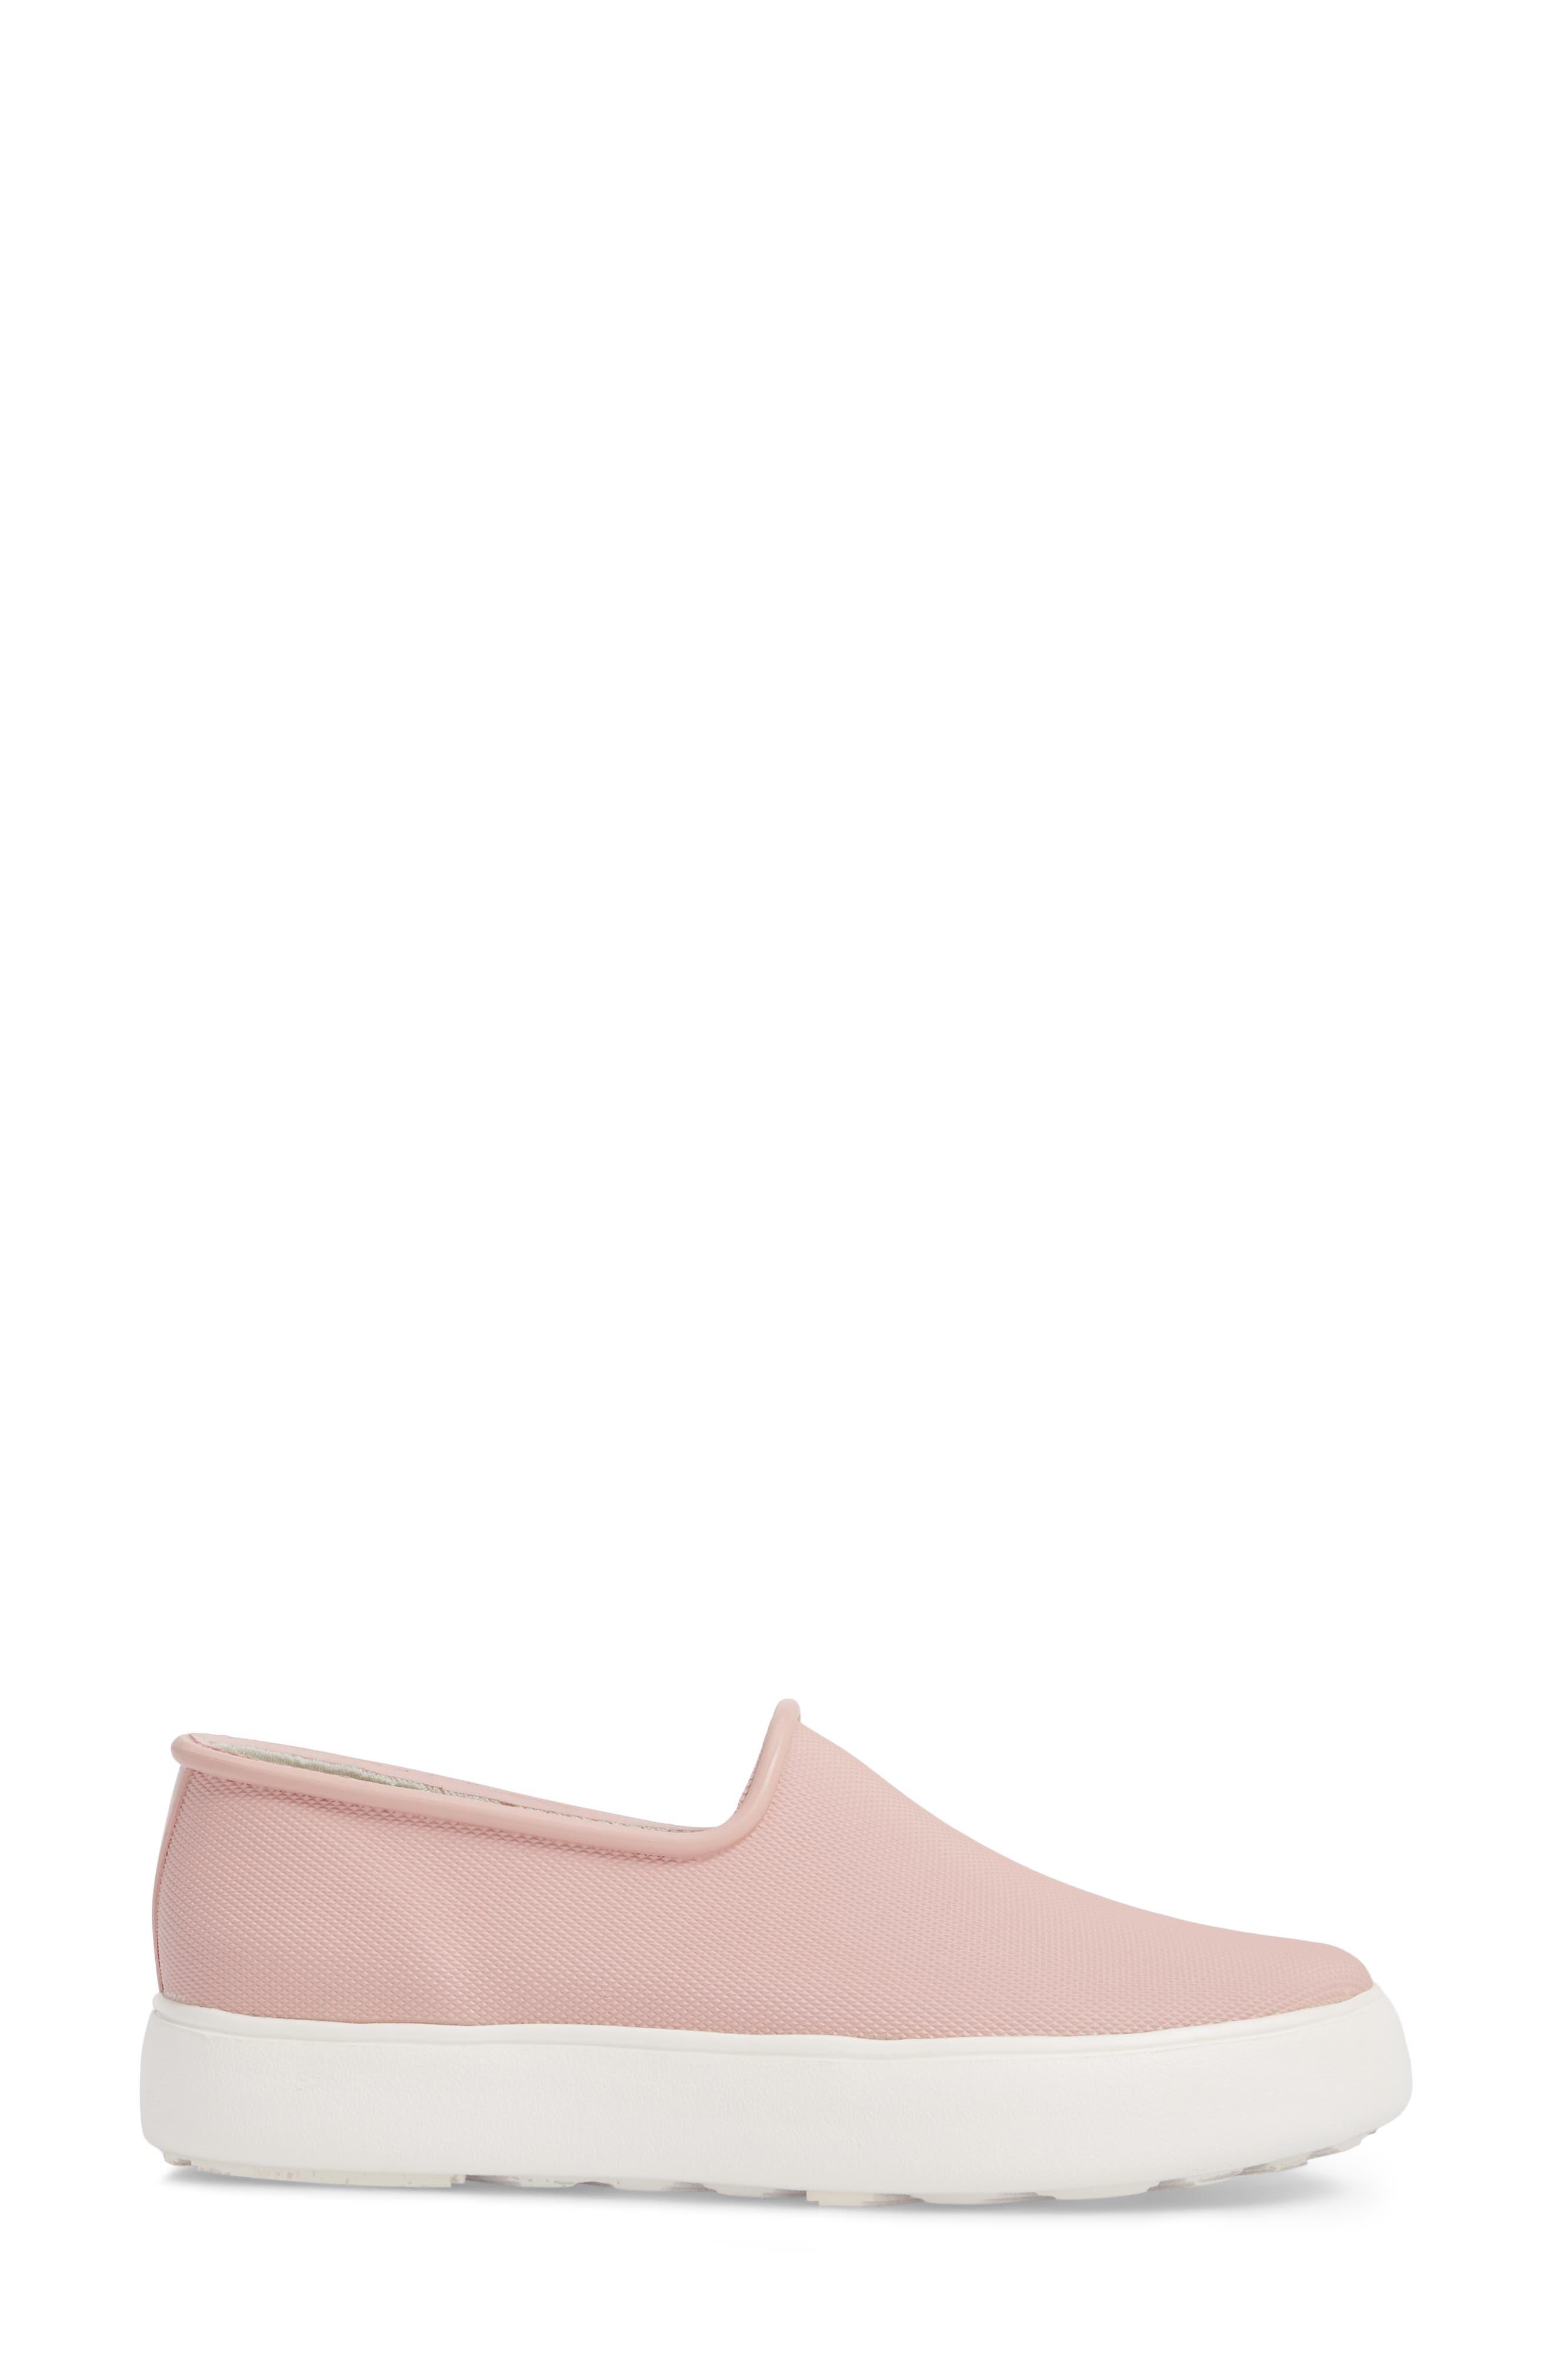 Rainy Day Waterproof Slip-On Sneaker,                             Alternate thumbnail 3, color,                             Dusty Pink